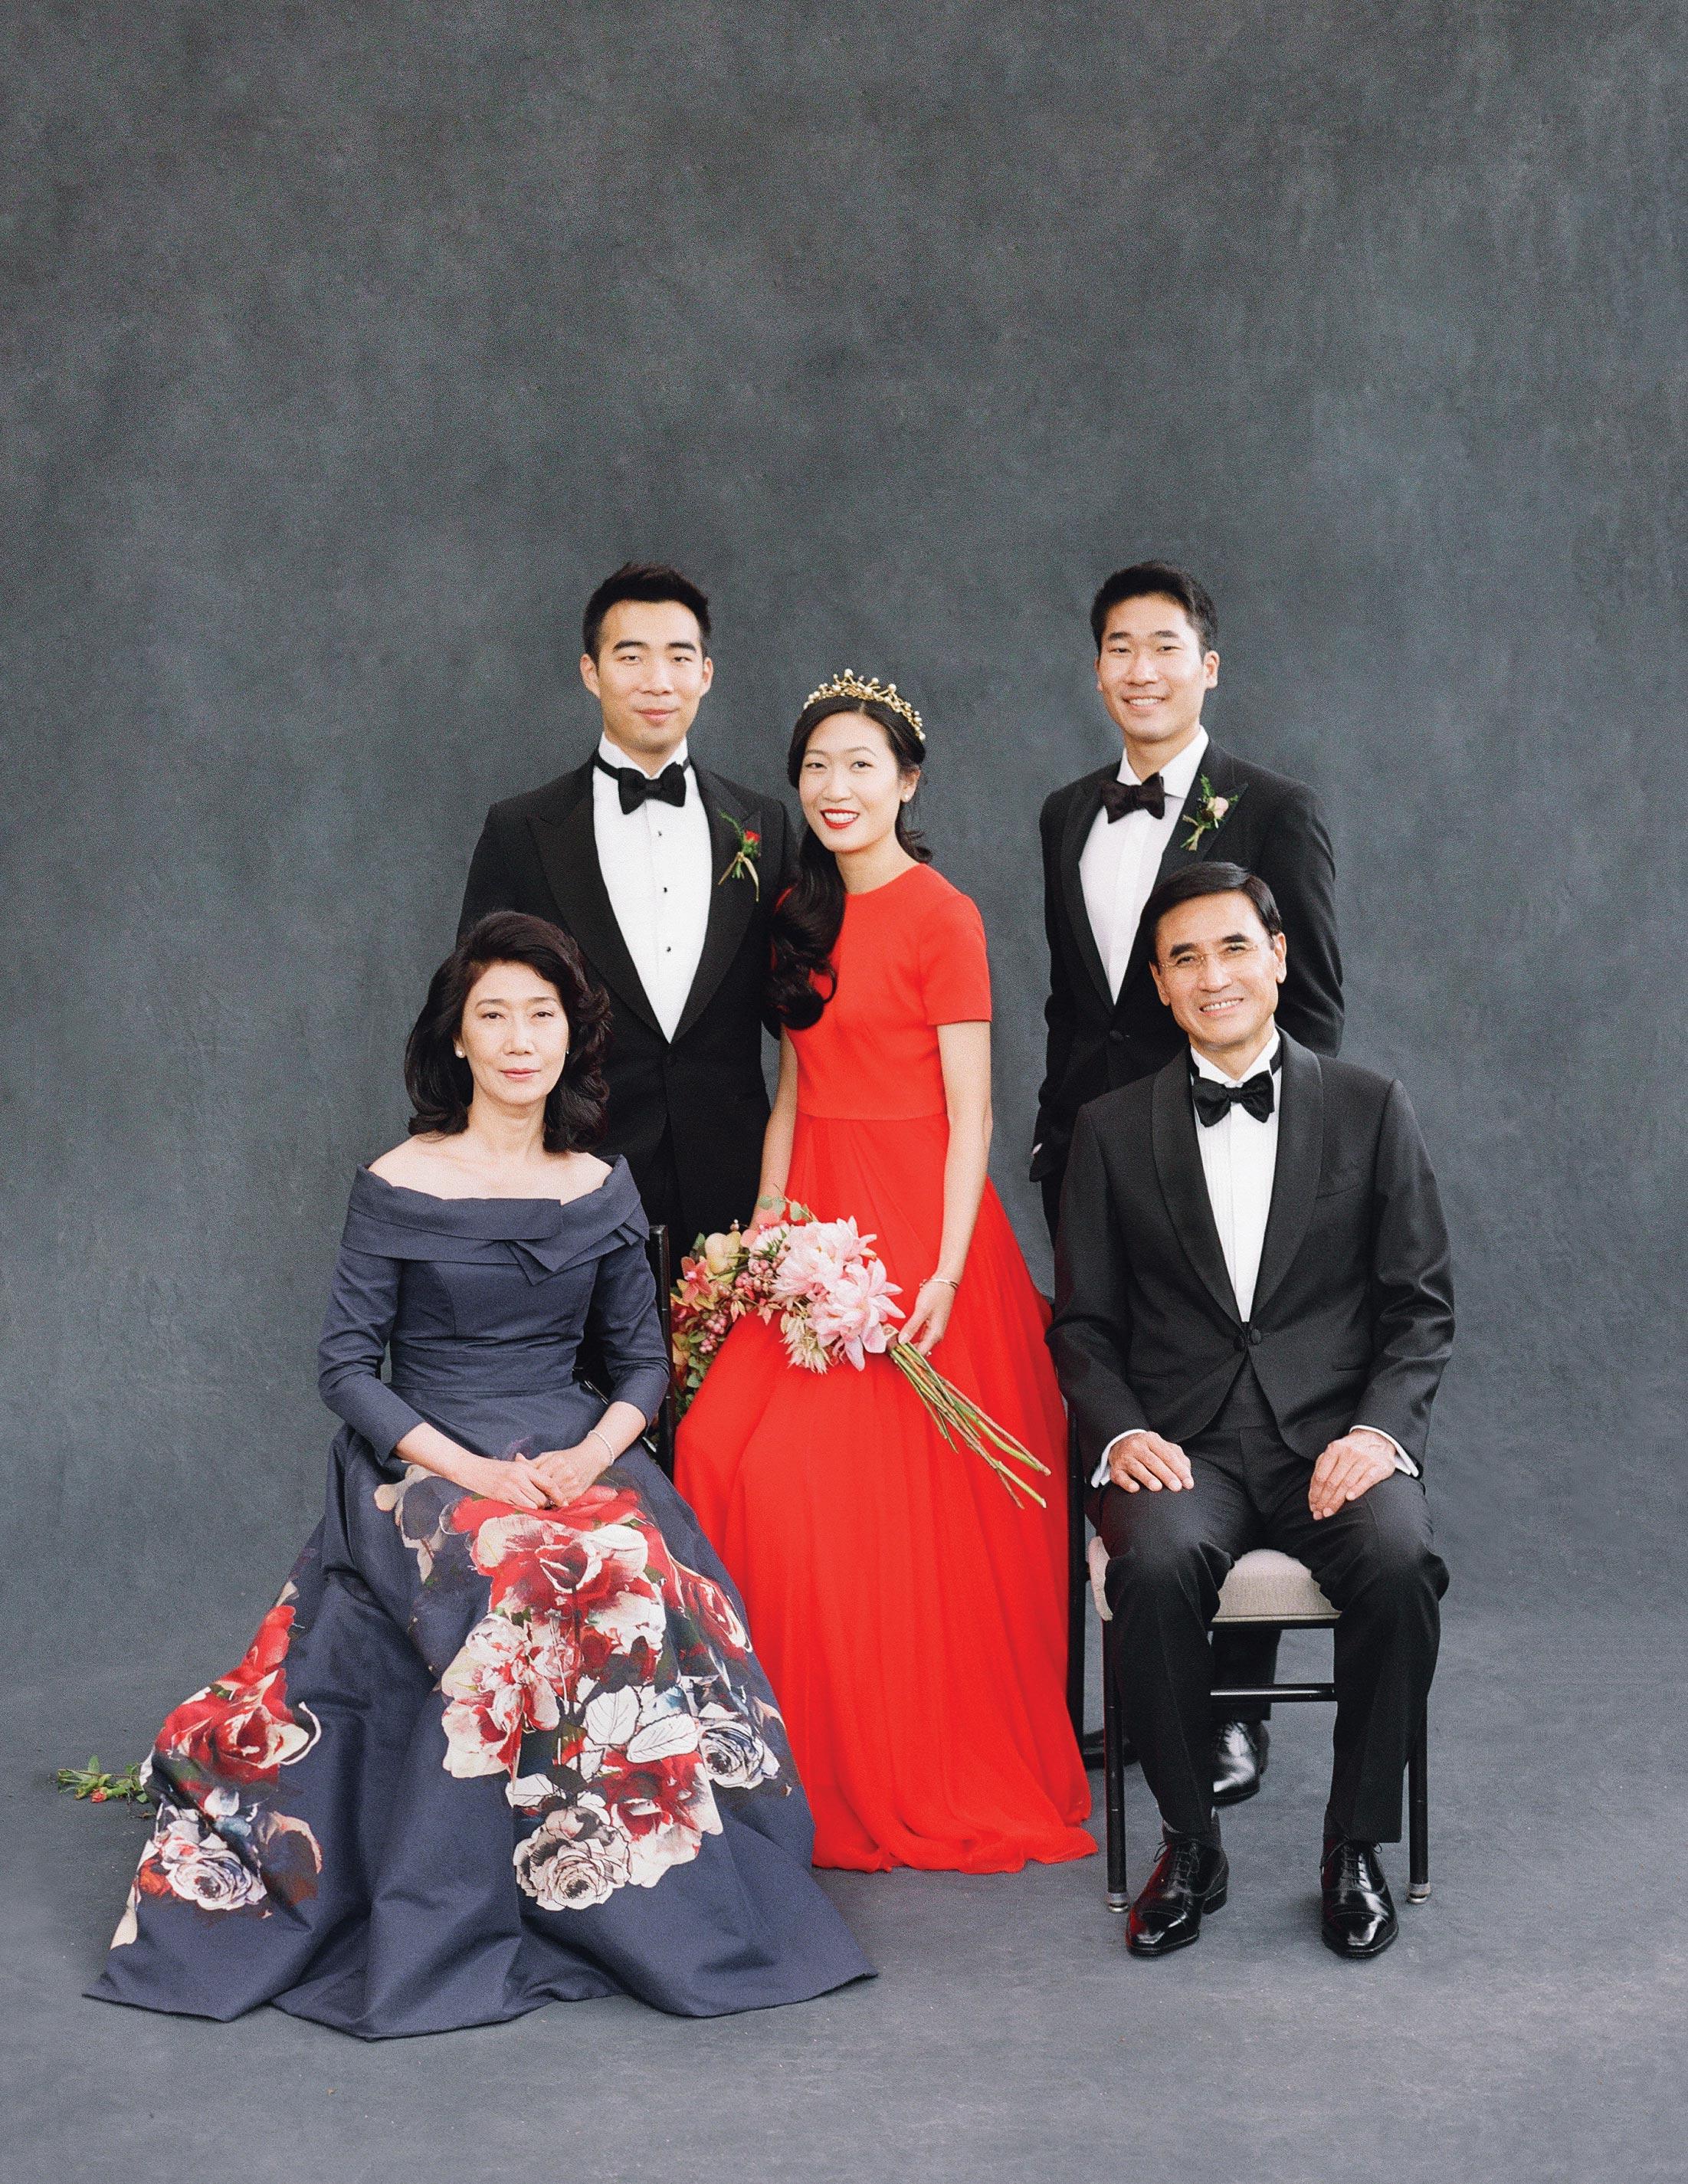 glara matthew wedding family portrait